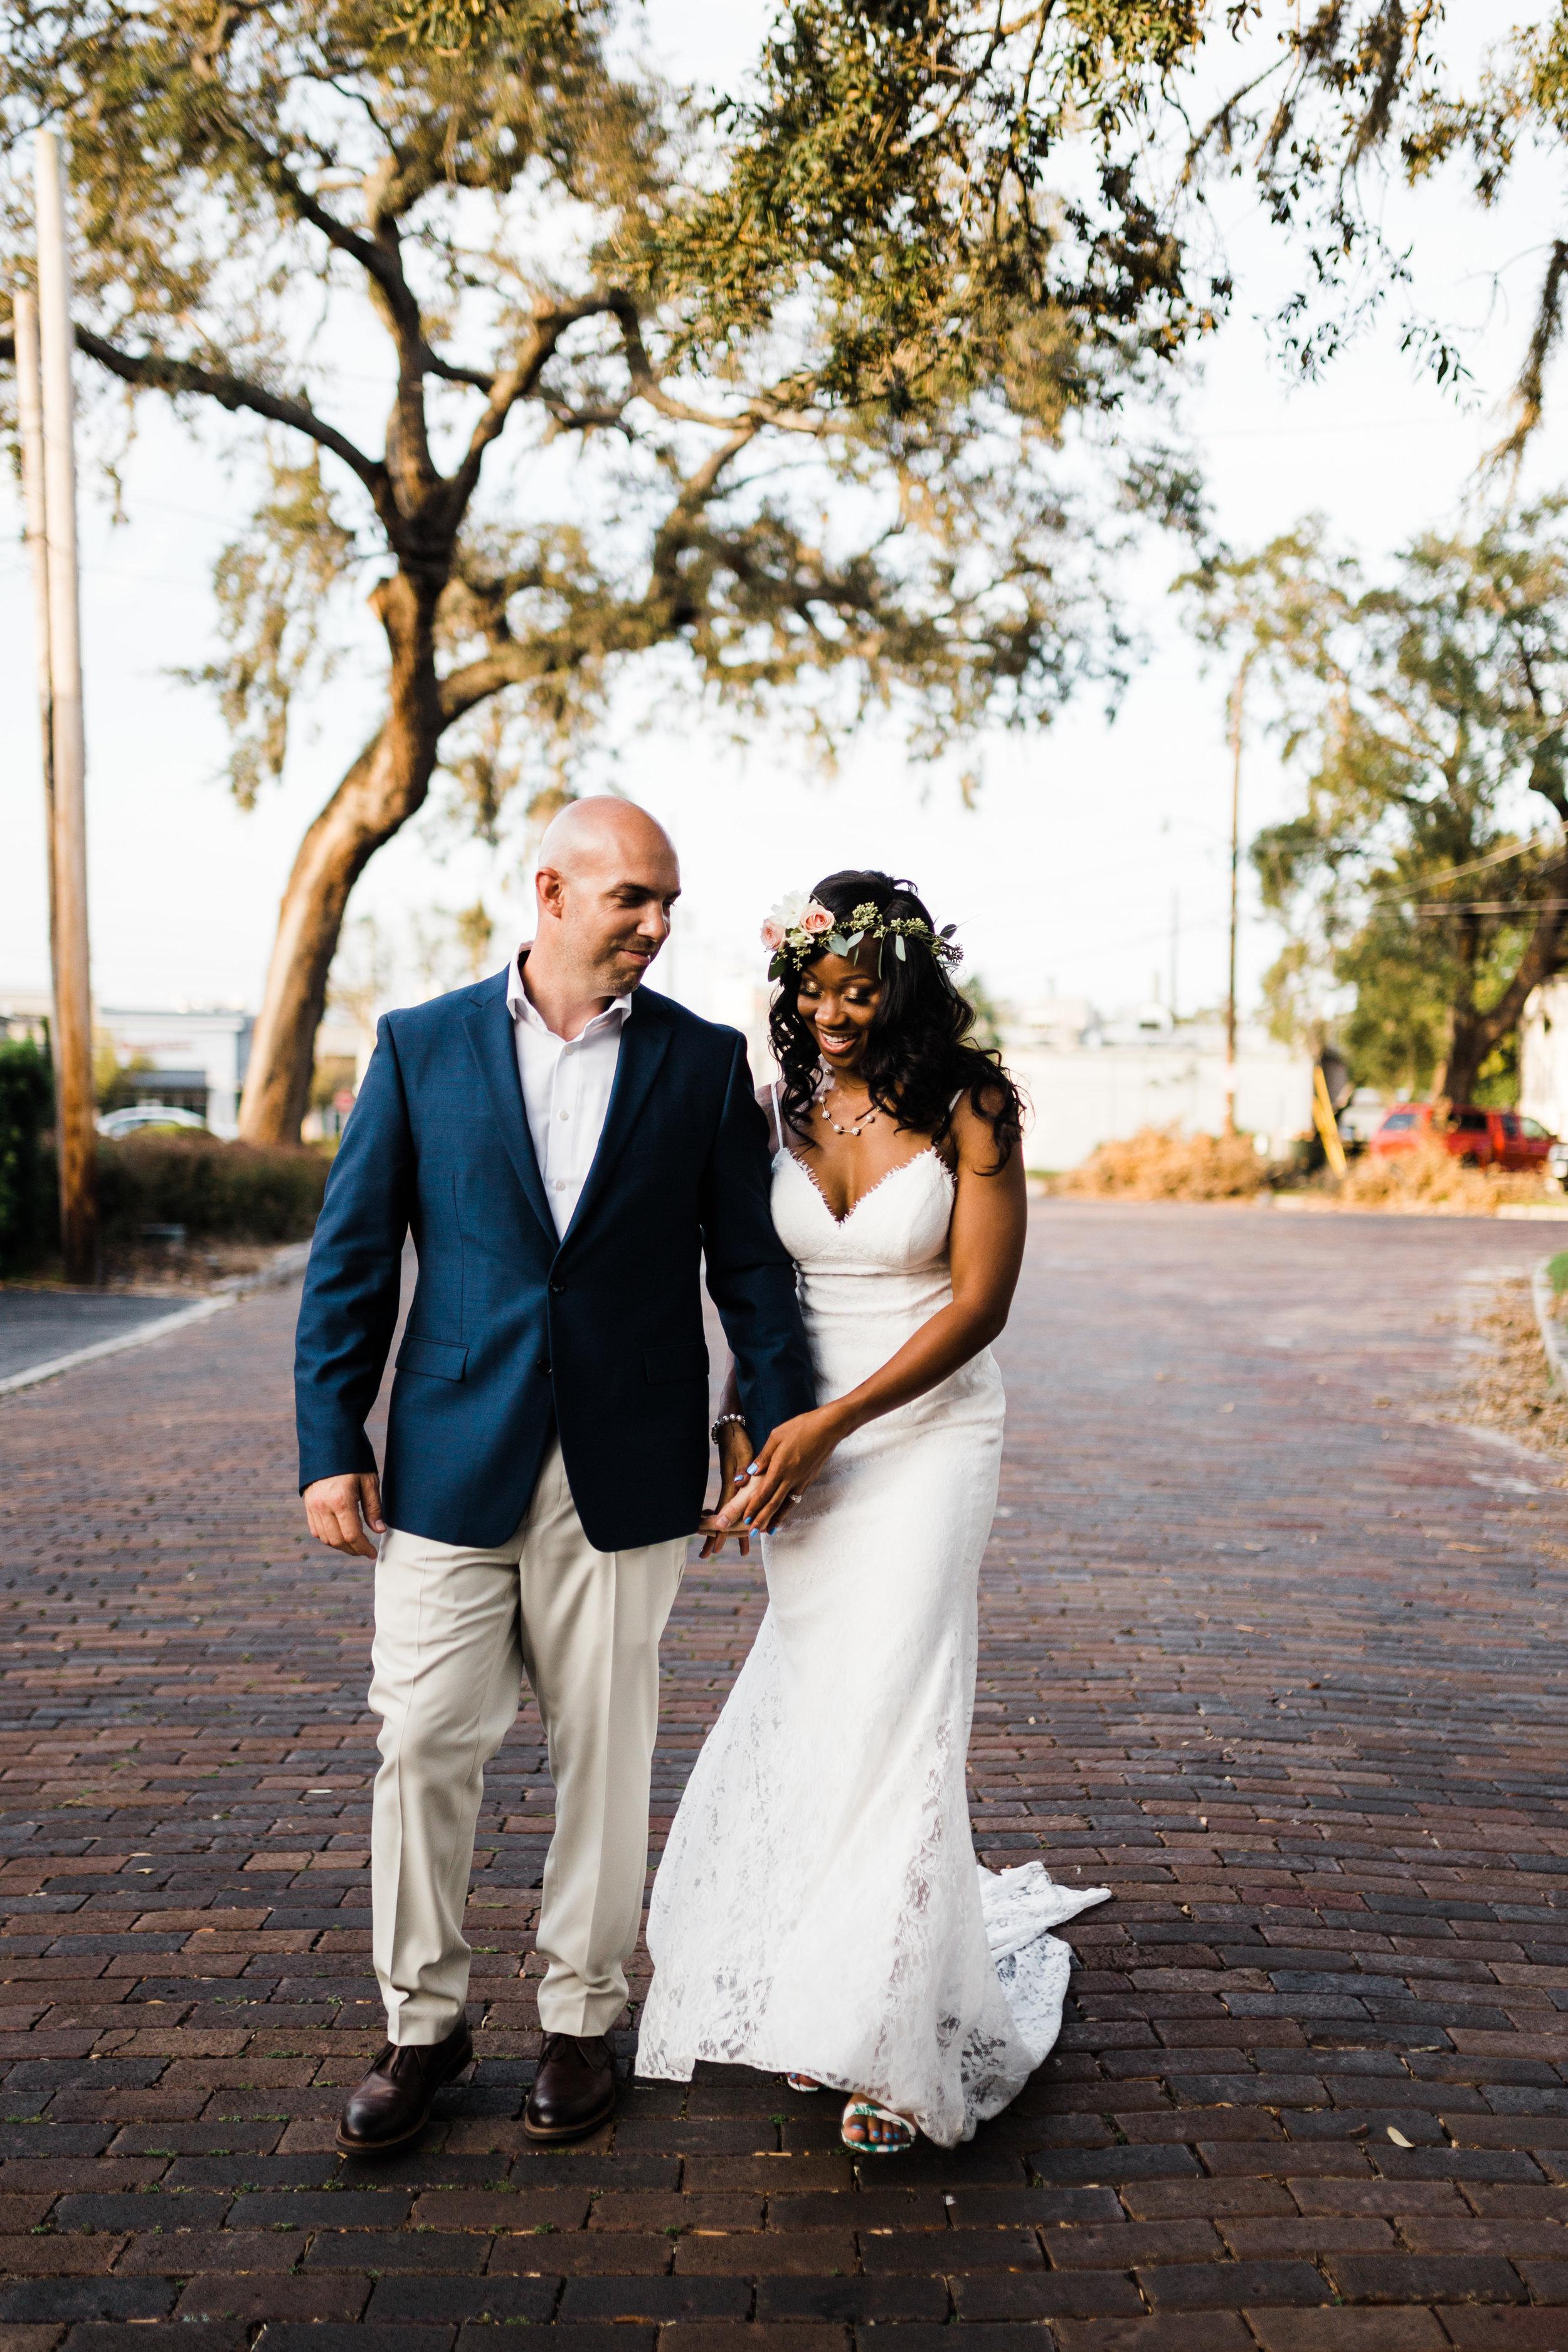 2017.09.16 Ashley and Chuck O'Day Quantam Leap Winery Wedding (406 of 462).jpg